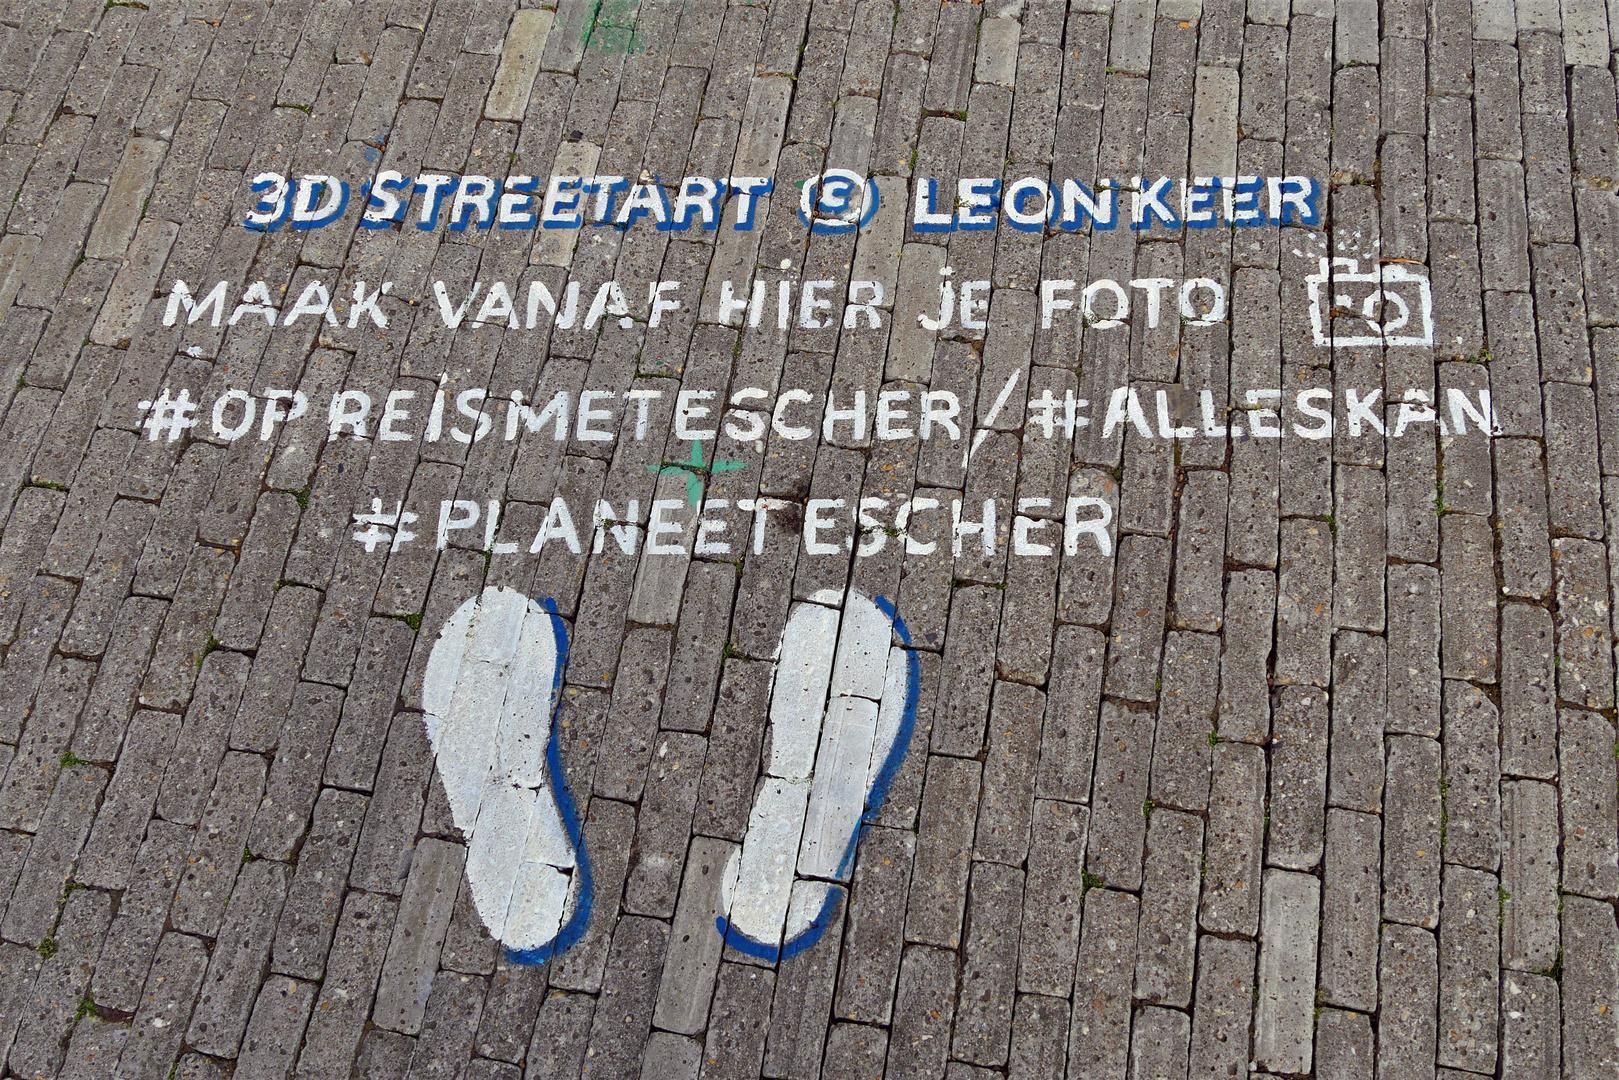 STREETART LEONKEER